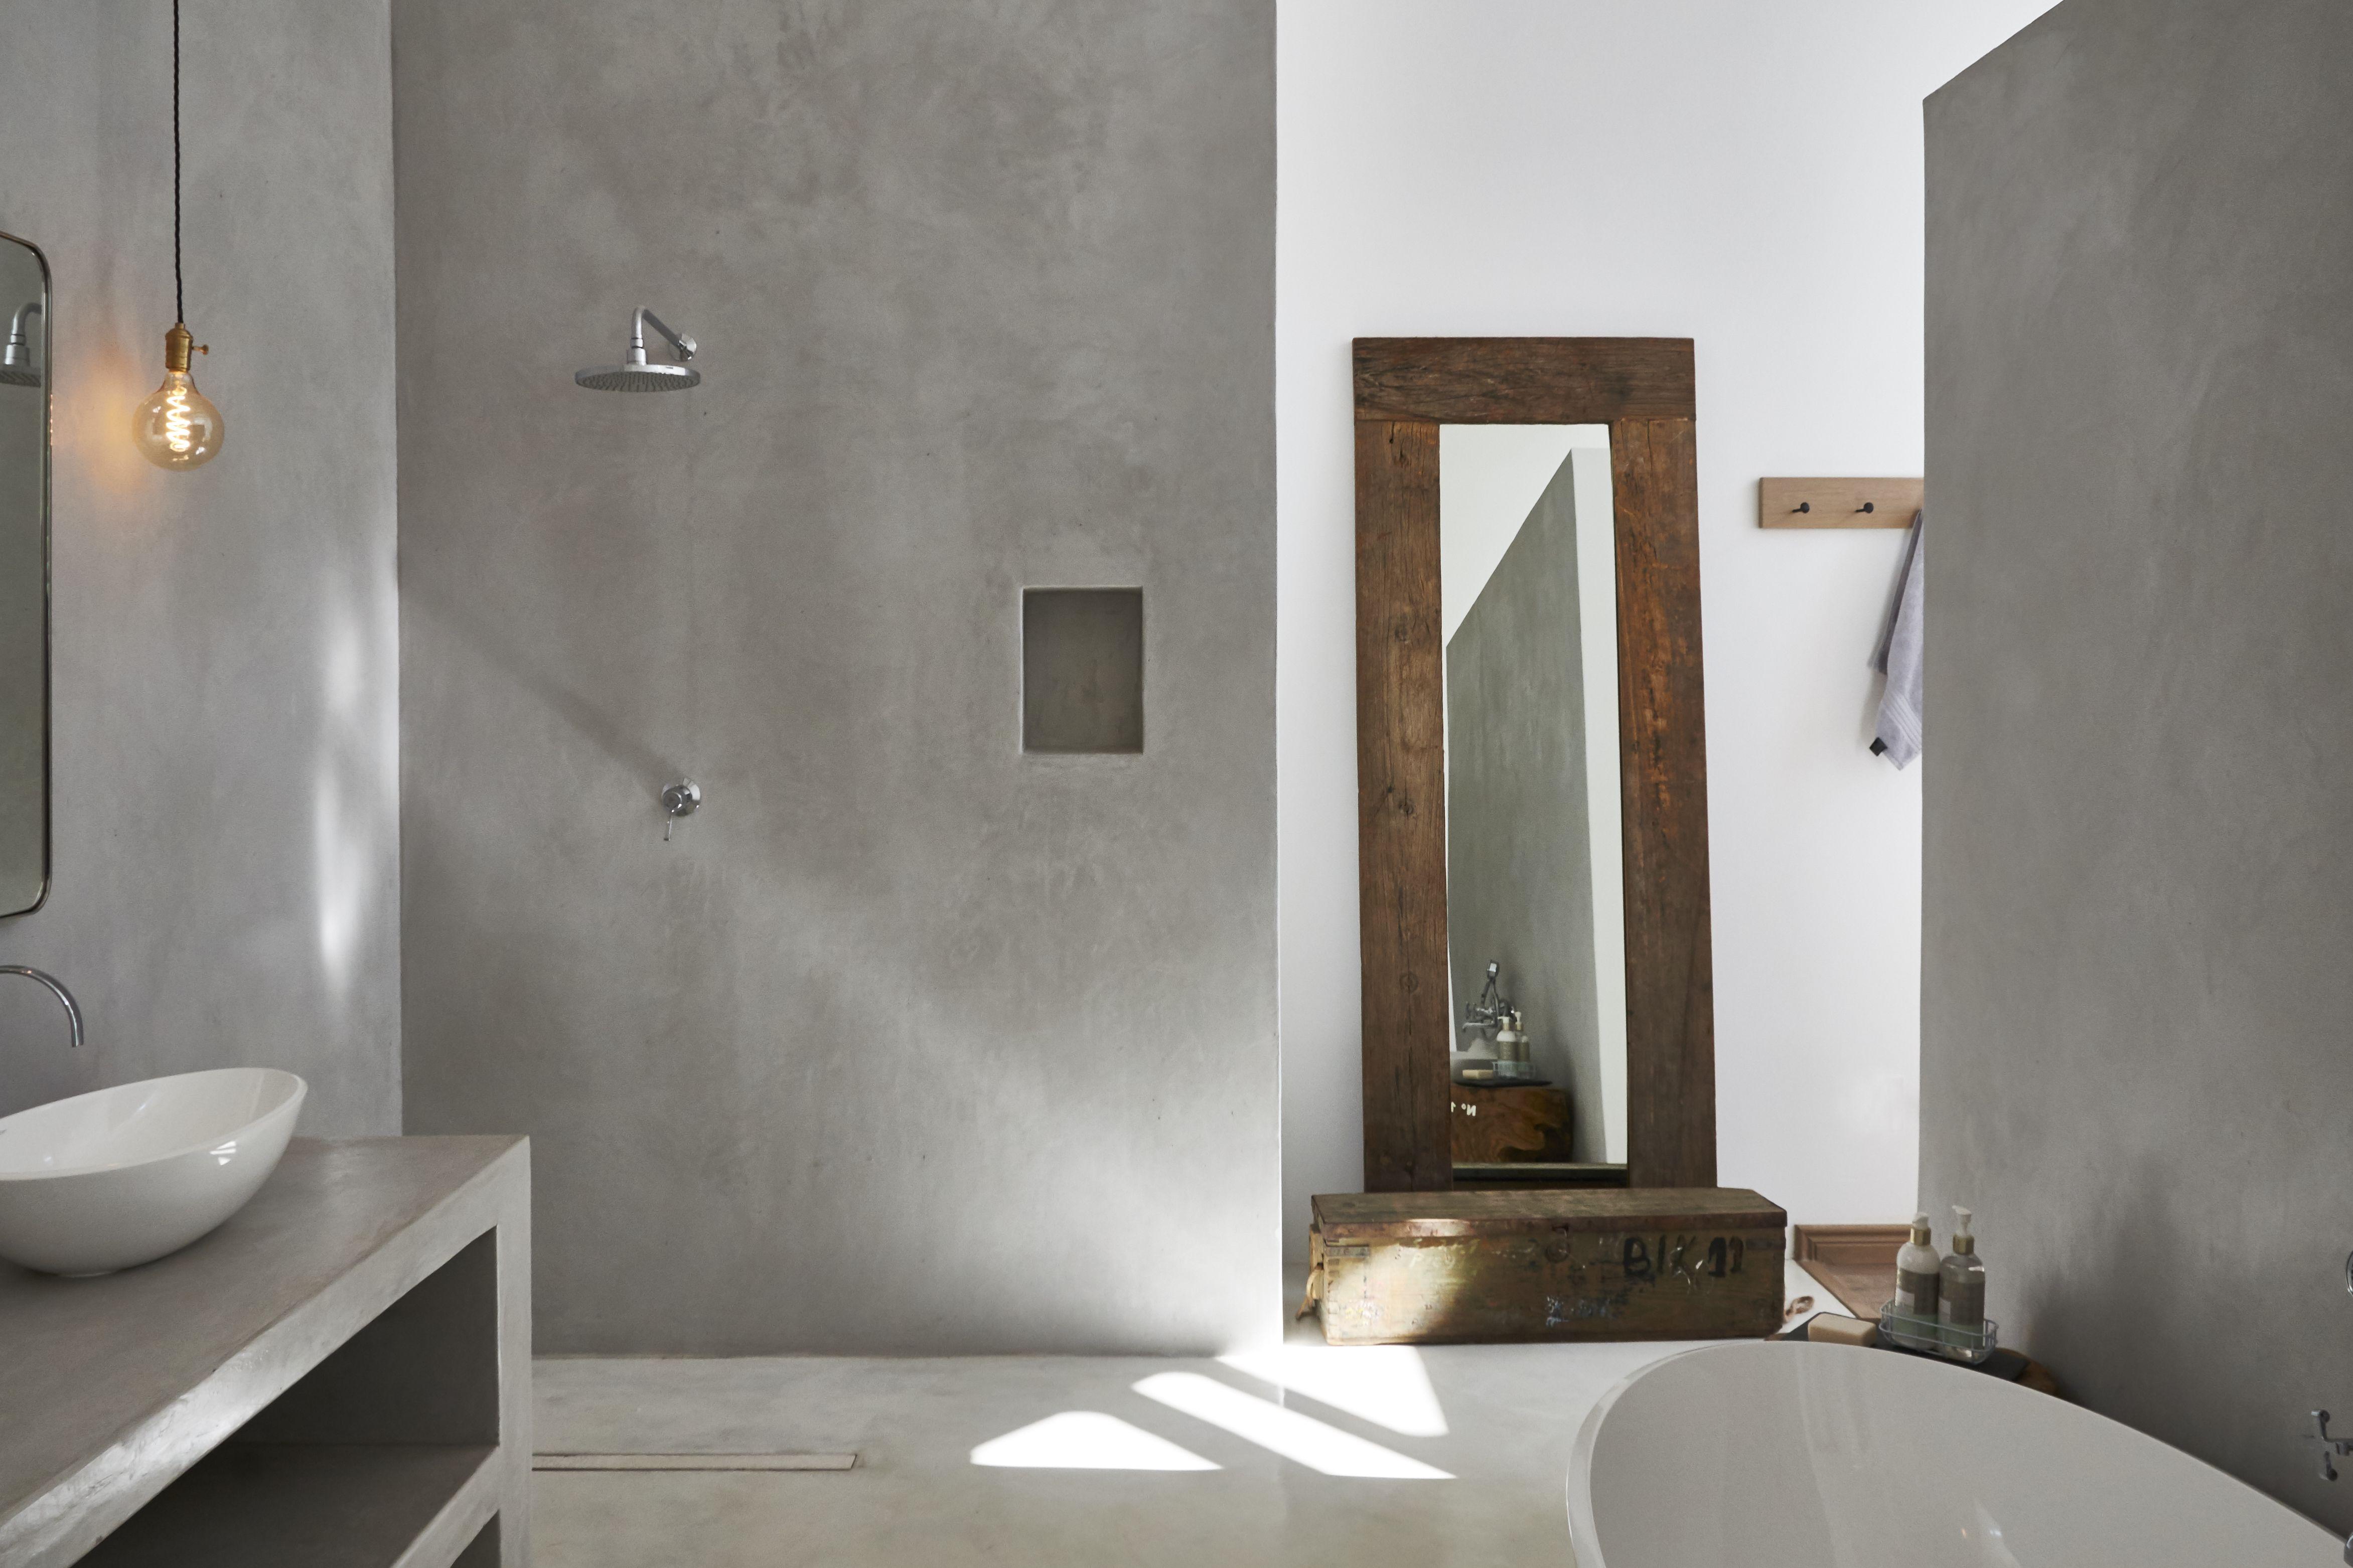 Satincrete Is A 2 3mm Coloured Cement Based Decorative